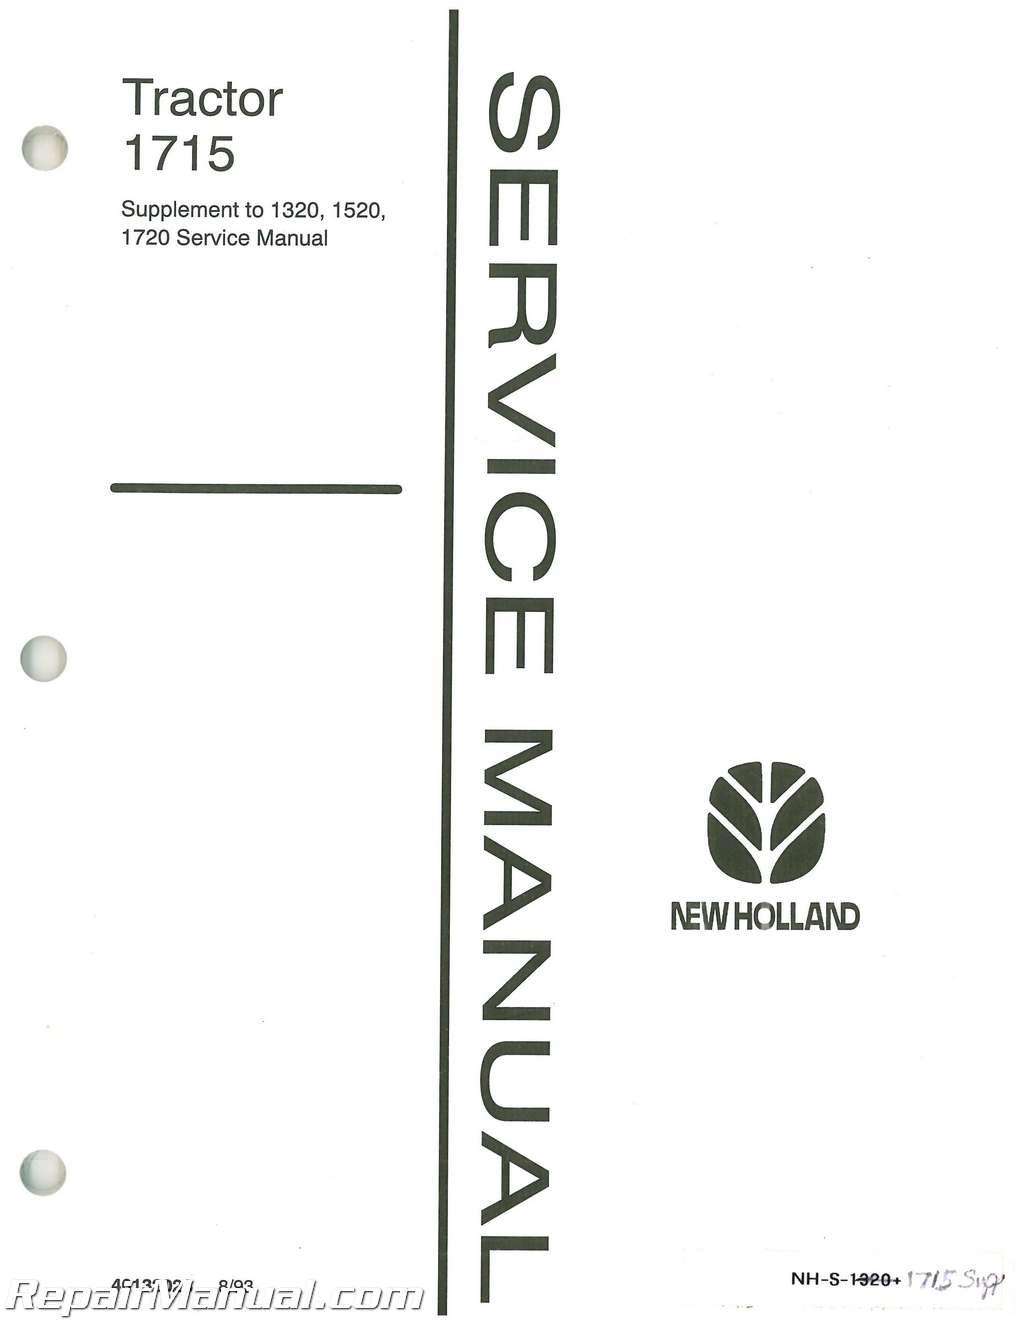 Ford Tractor Repair Manual Supplement